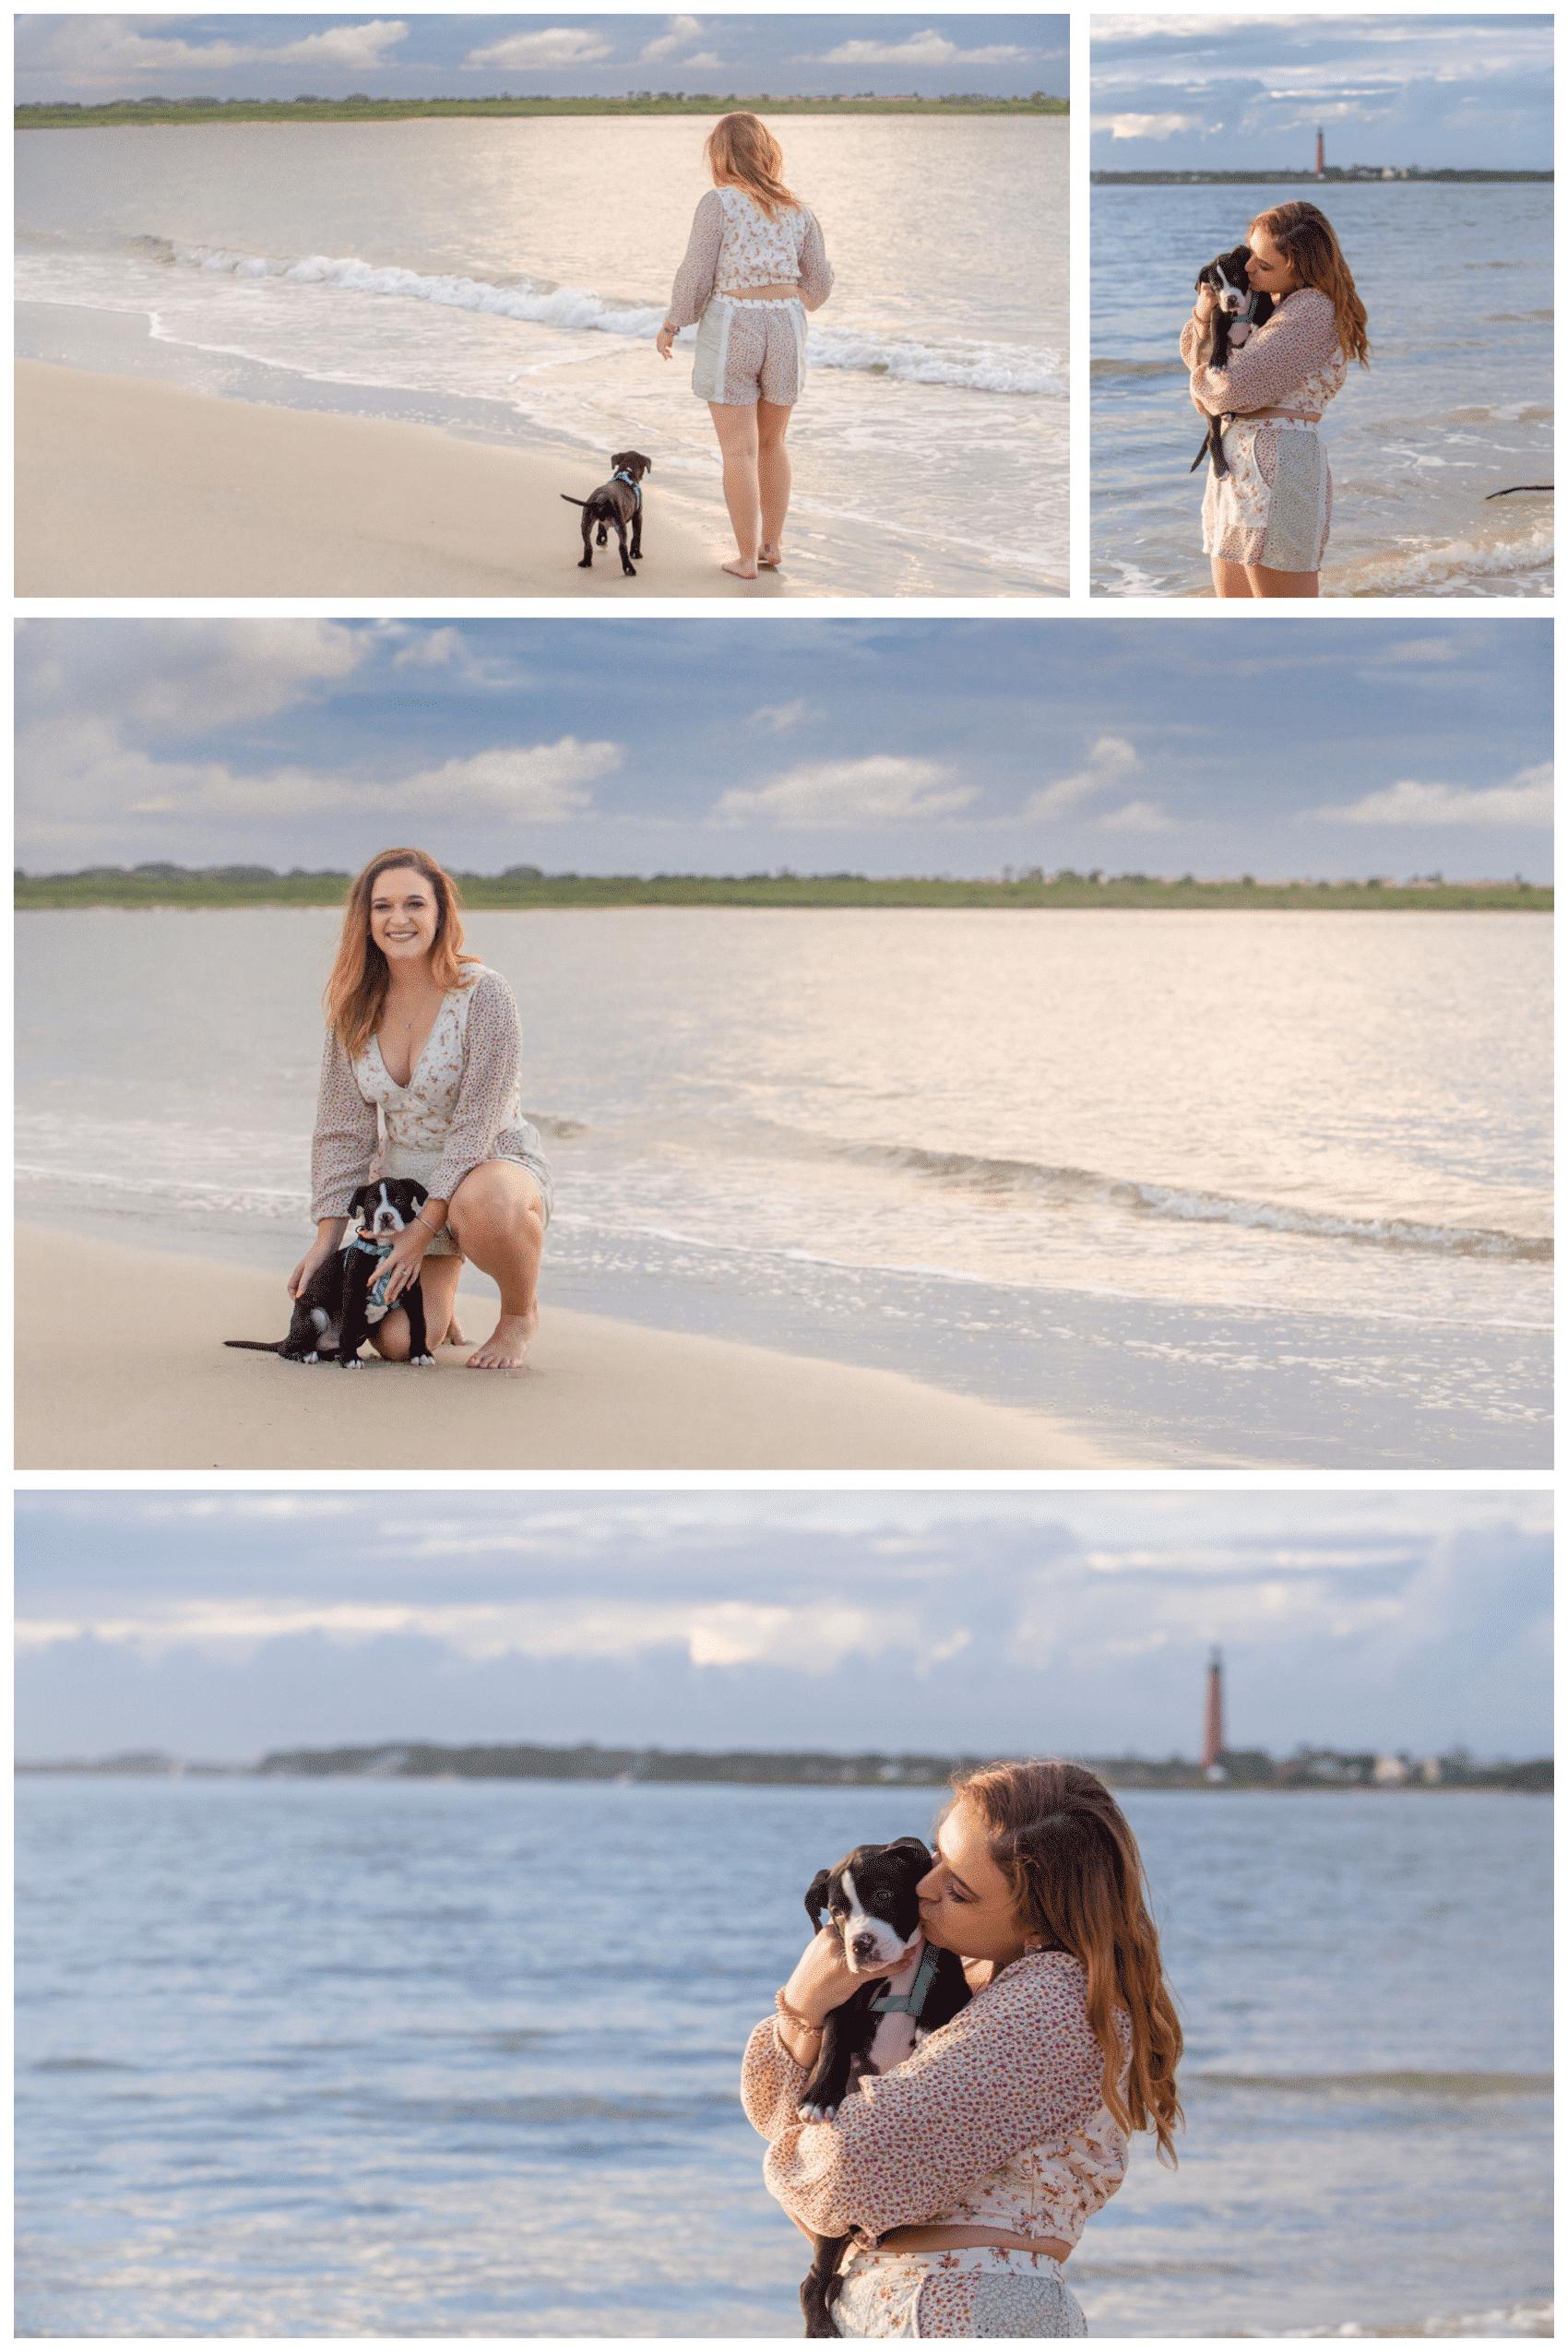 dog beach photo in Florida